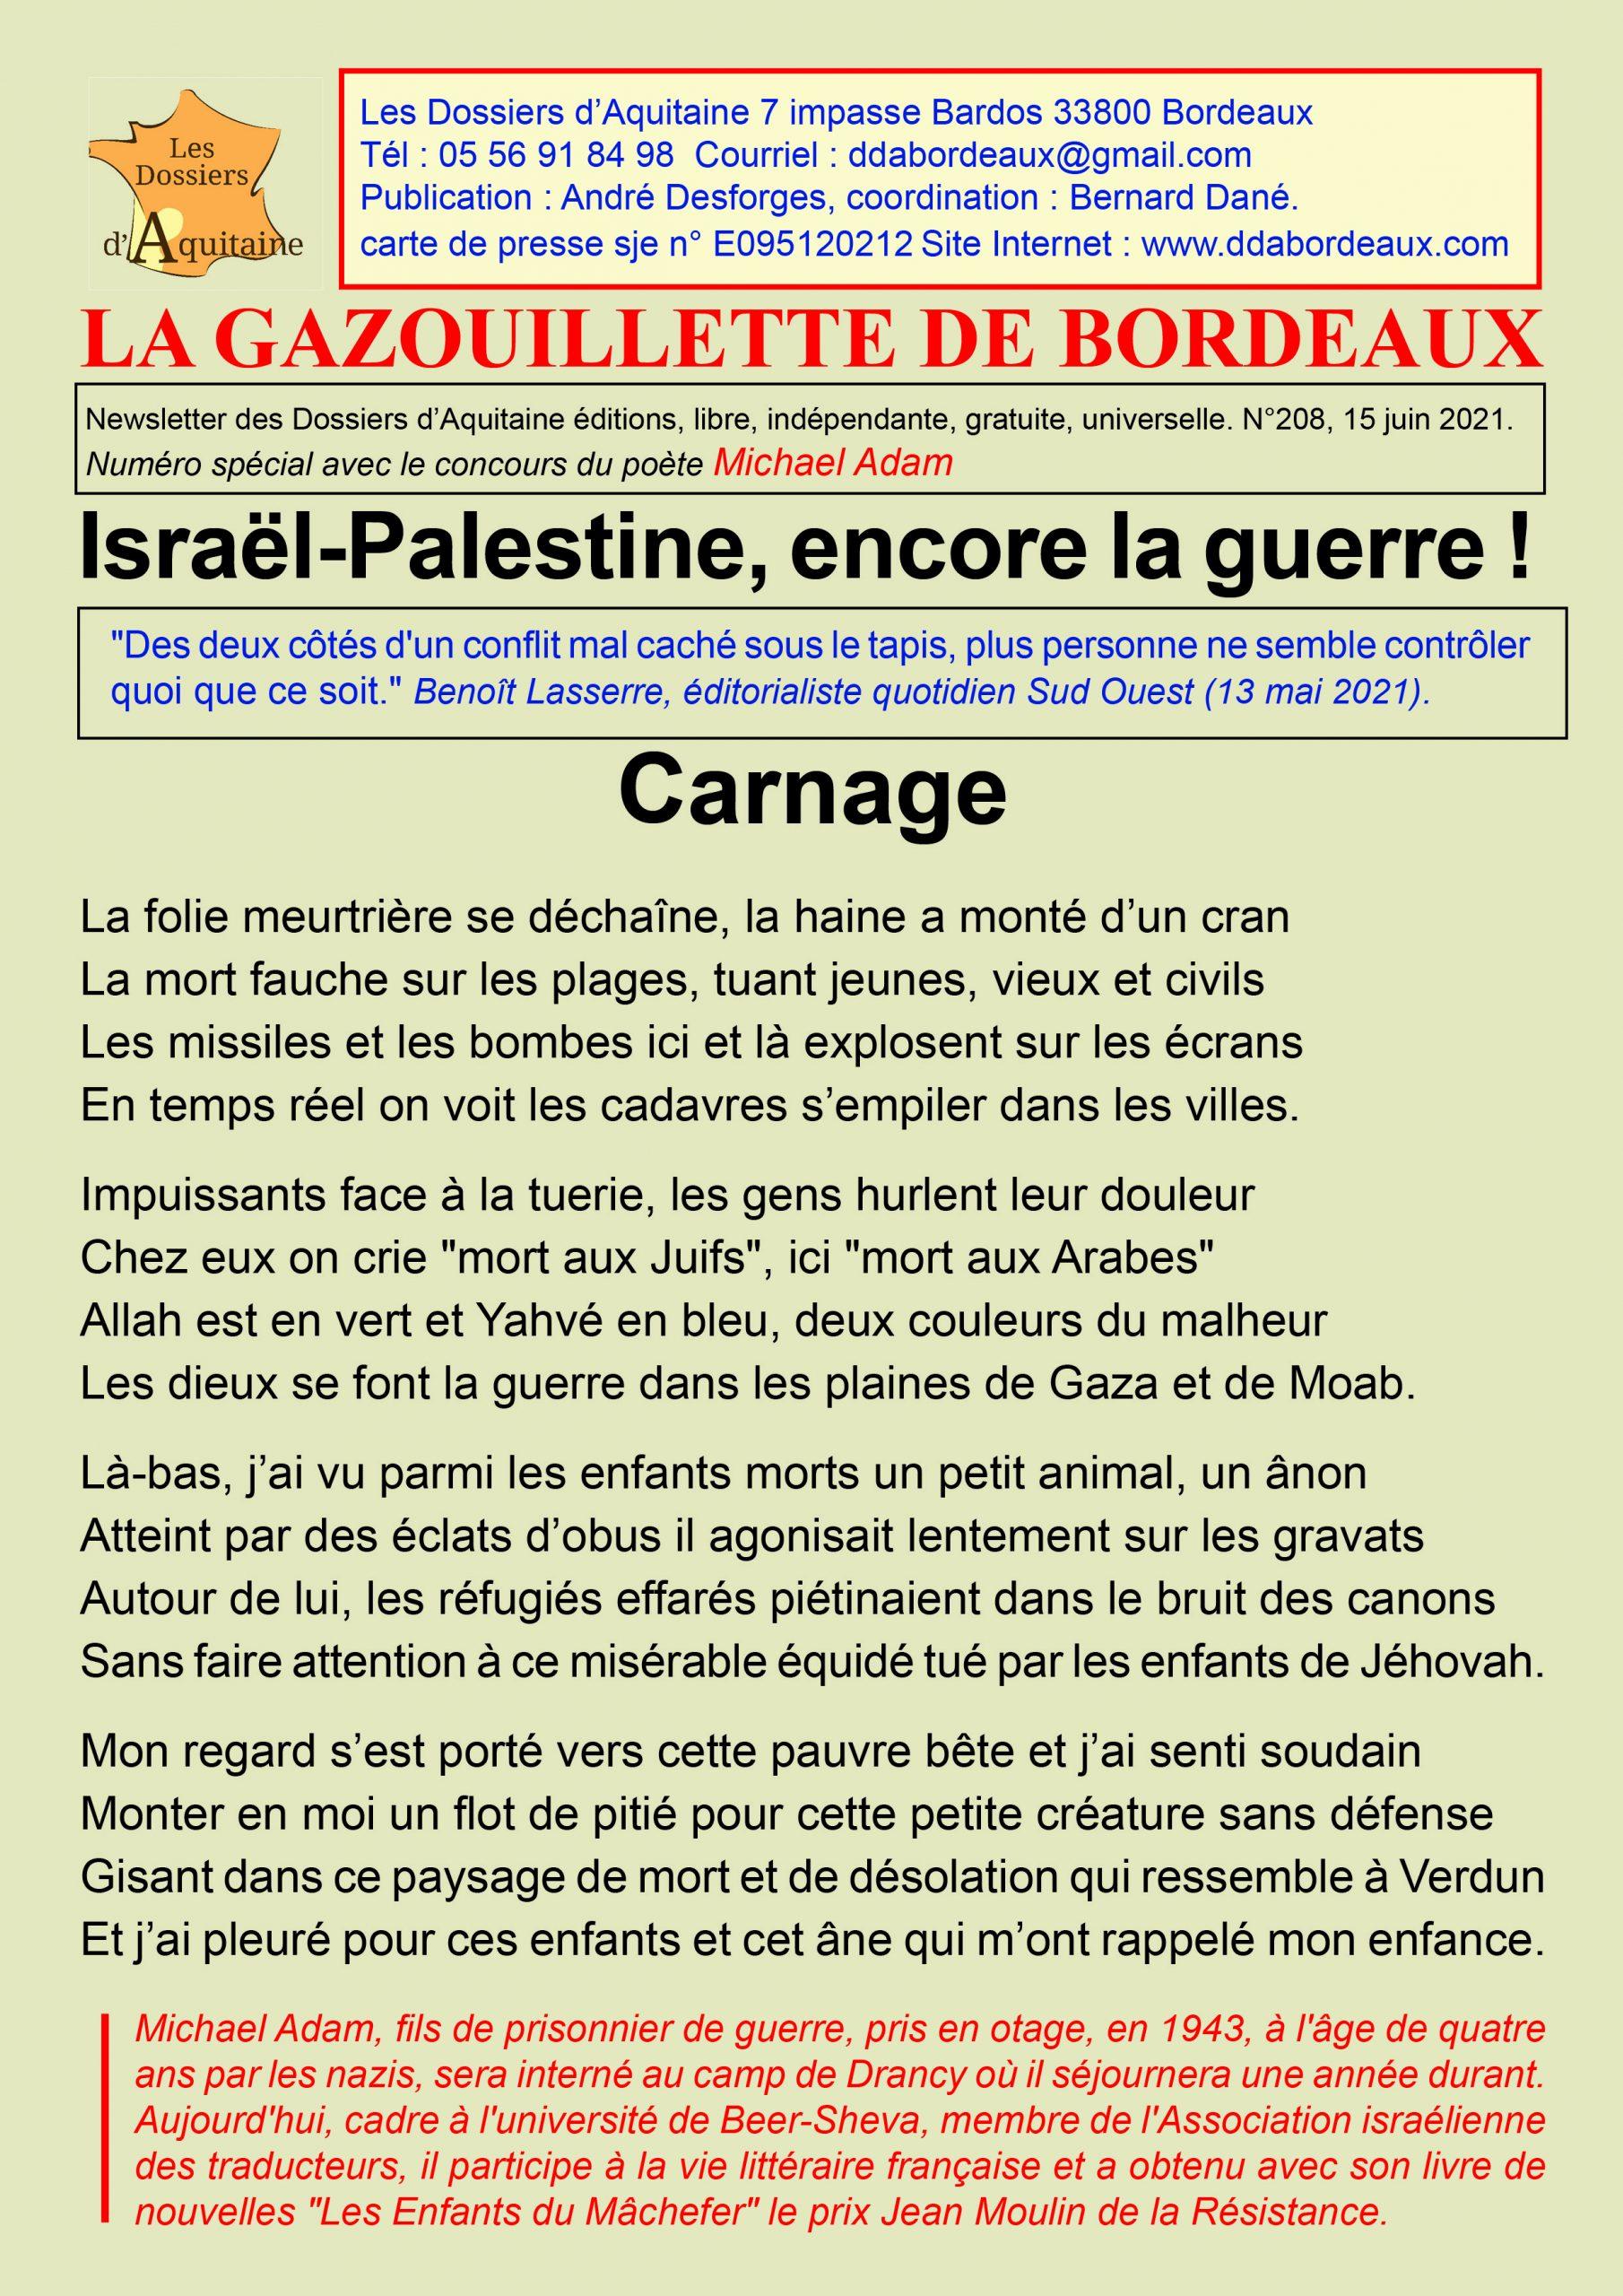 Israël-Palestine, encore la guerre!